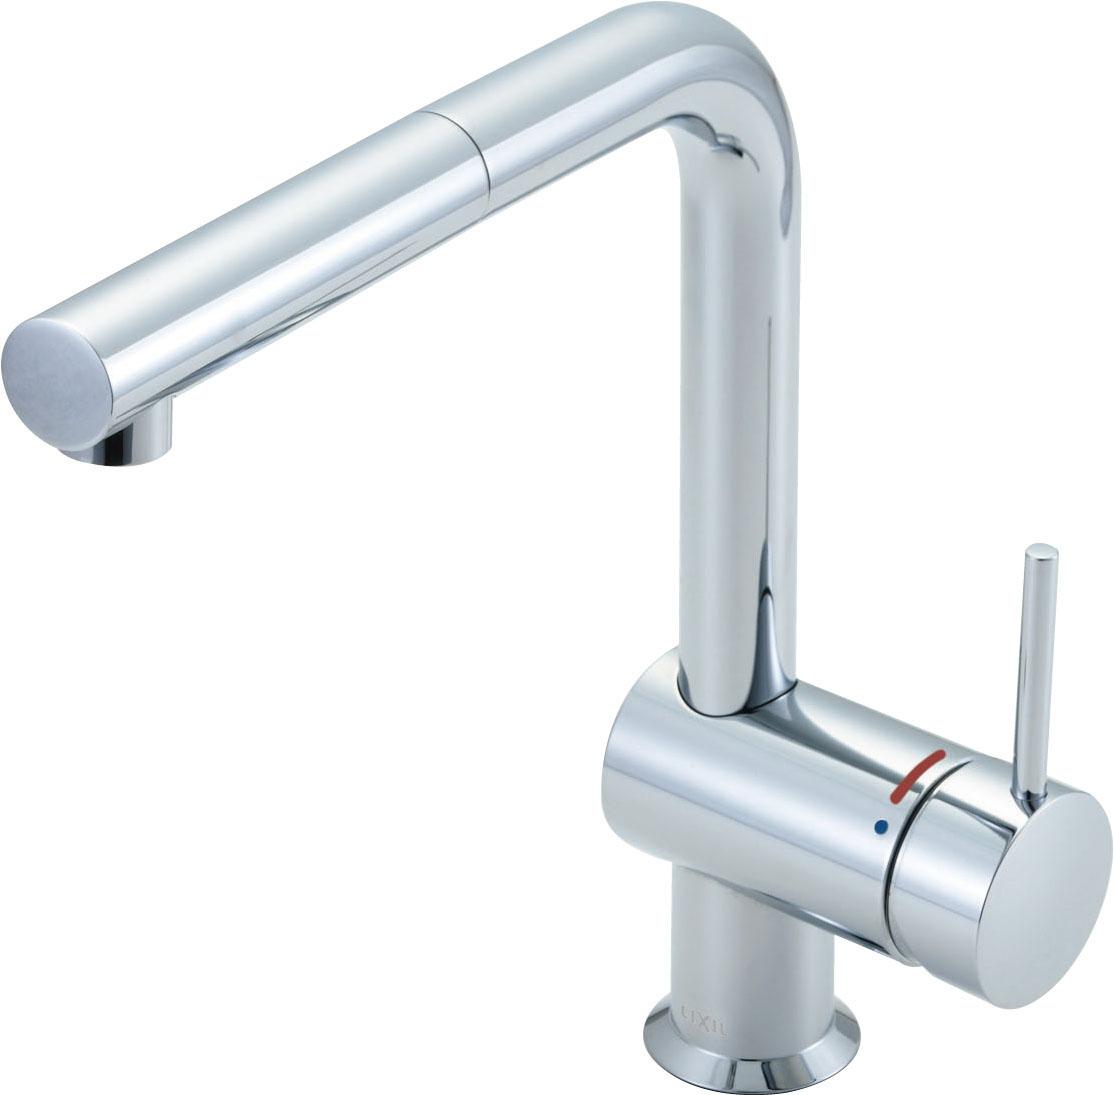 LIXIL リクシル 【SF-E546SYN】 シリーズ名: eモダンLタイプ 品名: 吐水口引出式シングルレバー混合水栓[新品]